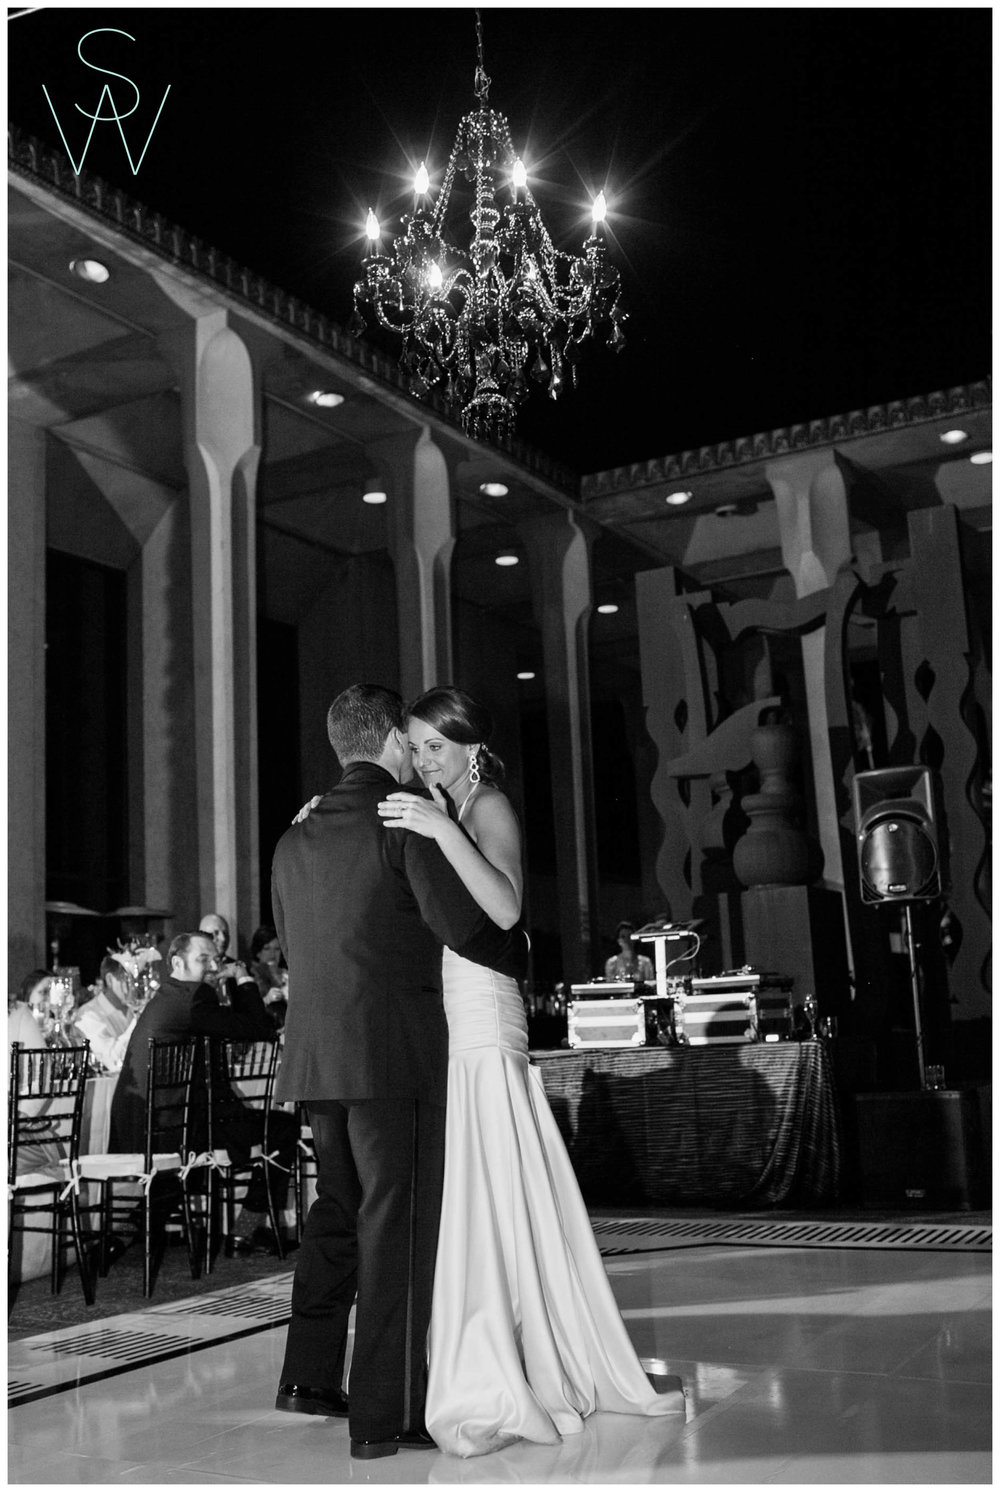 Shewanders.sdma_.wedding.photography-1094.jpg.wedding.photography-1094.jpg